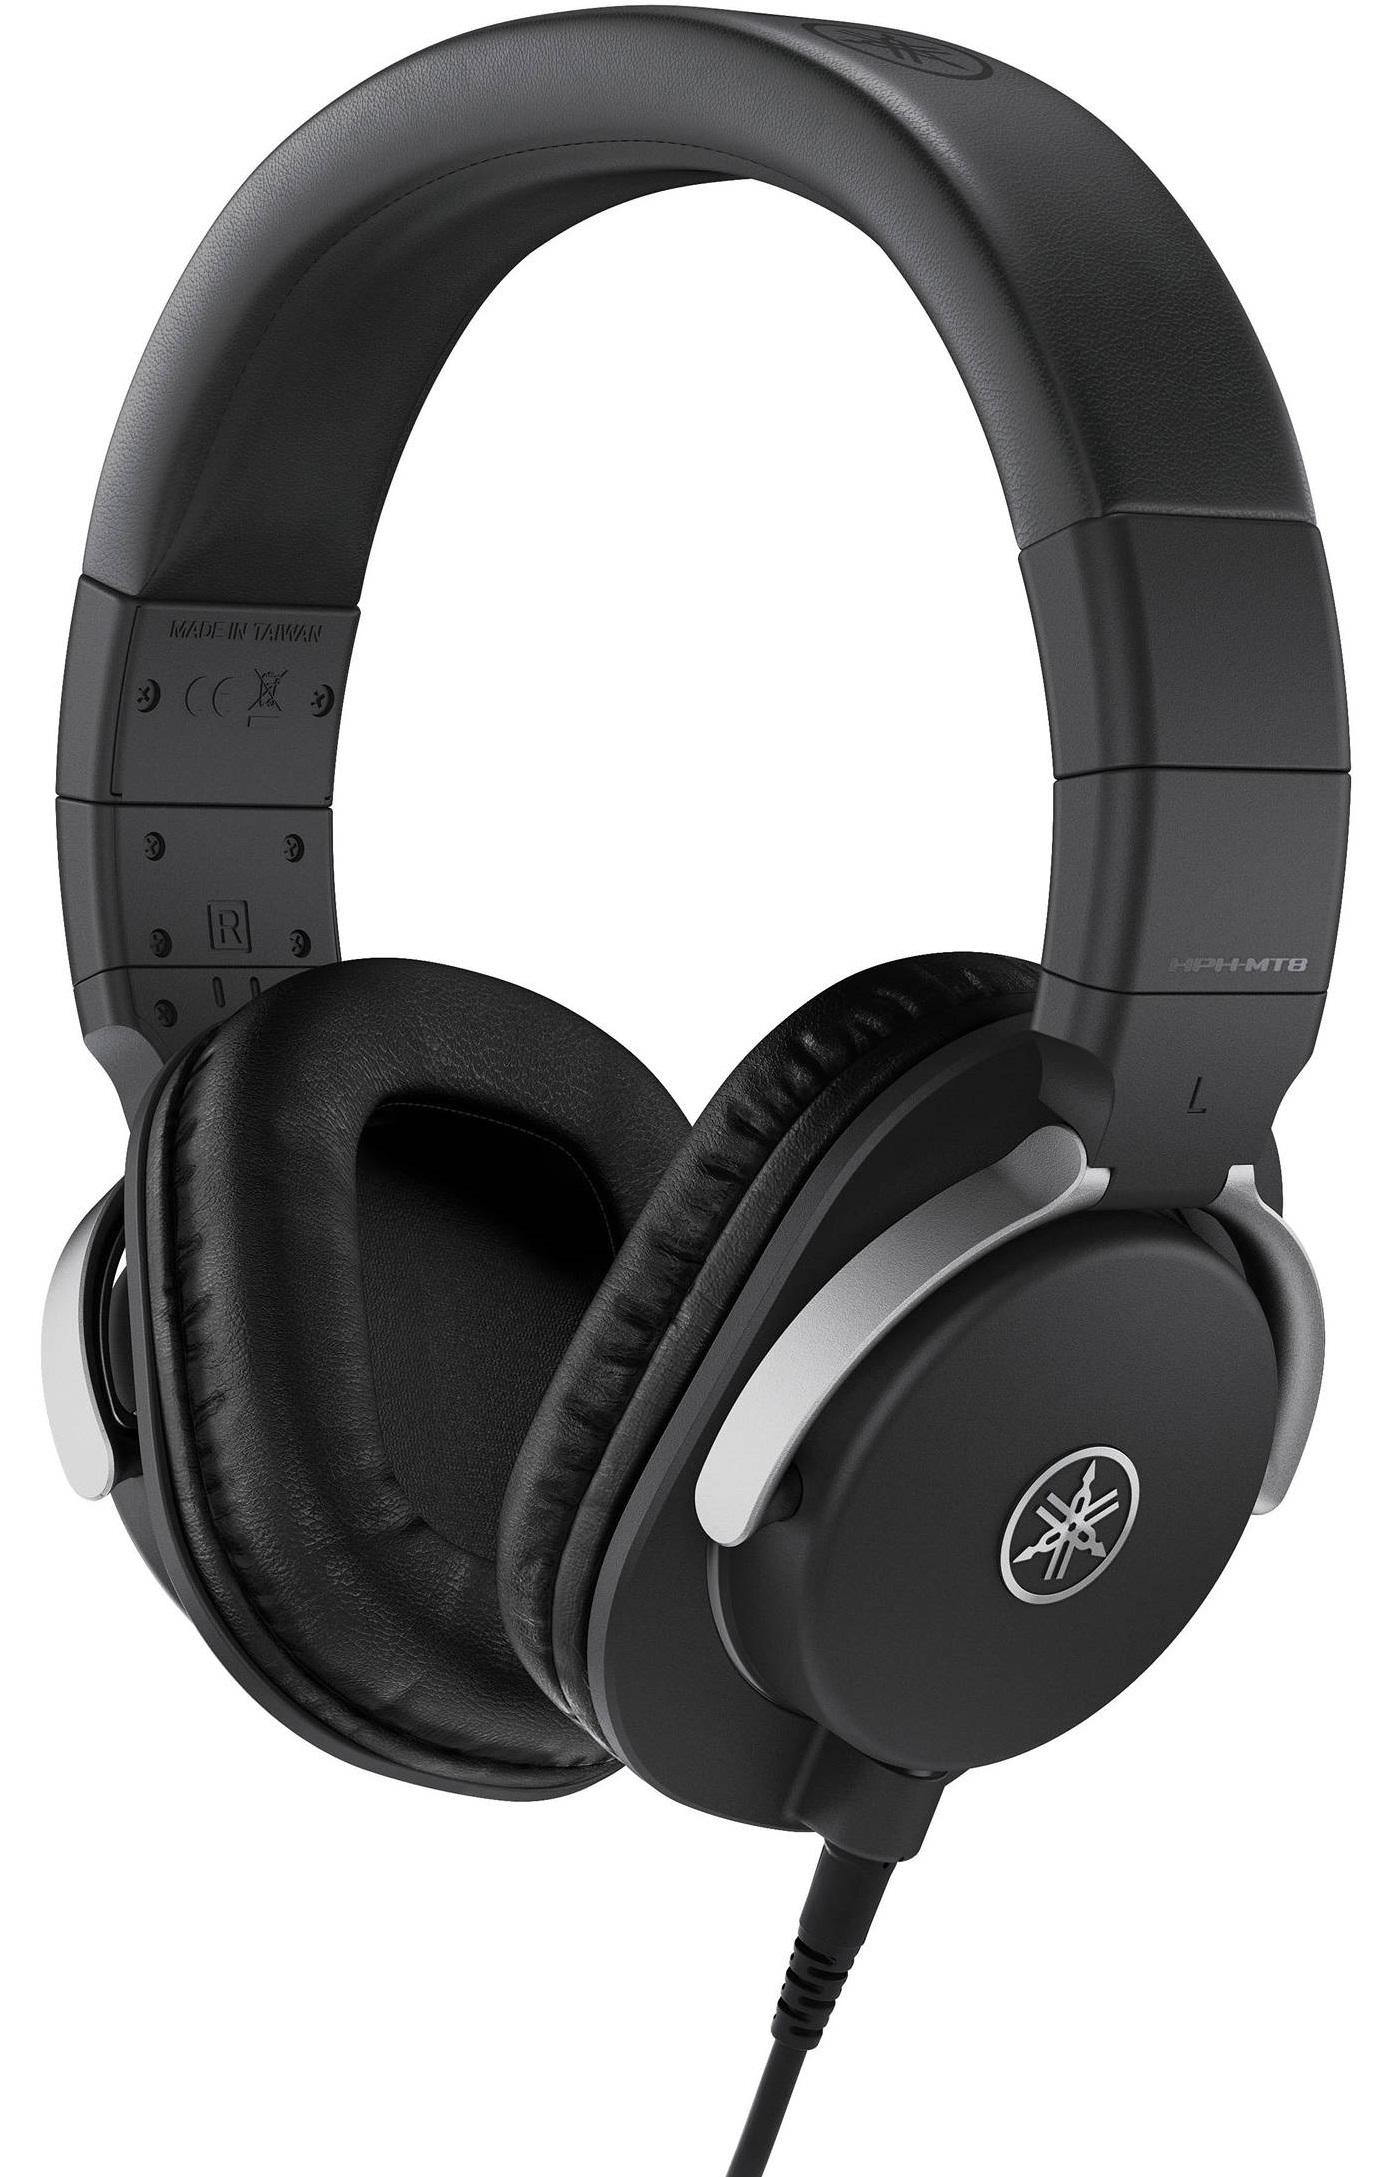 yamaha-hph-mt8-studio-monitor-headphones.jpeg